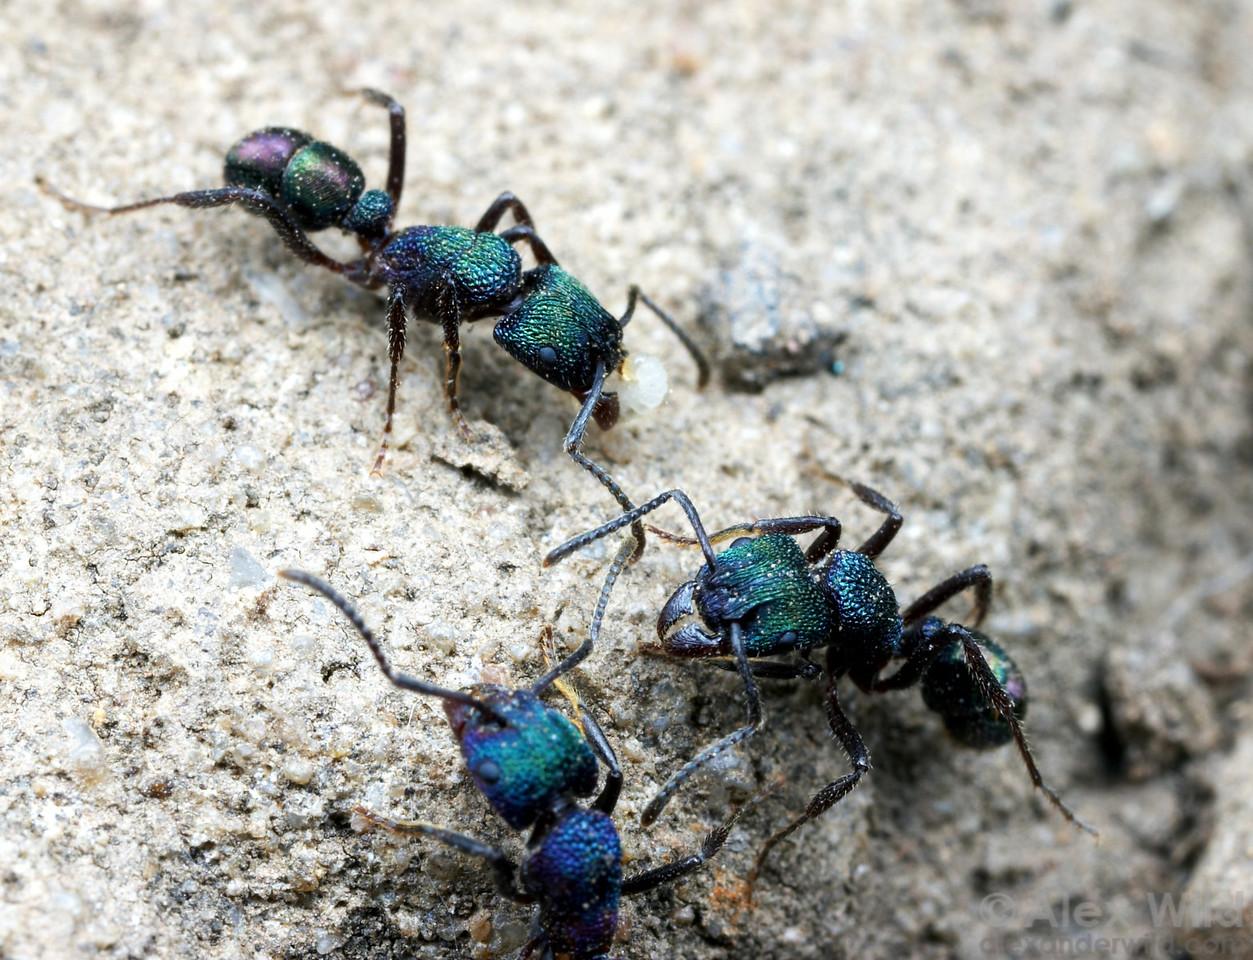 The green-headed ant Rhytidoponera metallica is a common soil-nesting ant in urban areas throughout Australia.   Brisbane, Queensland, Australia